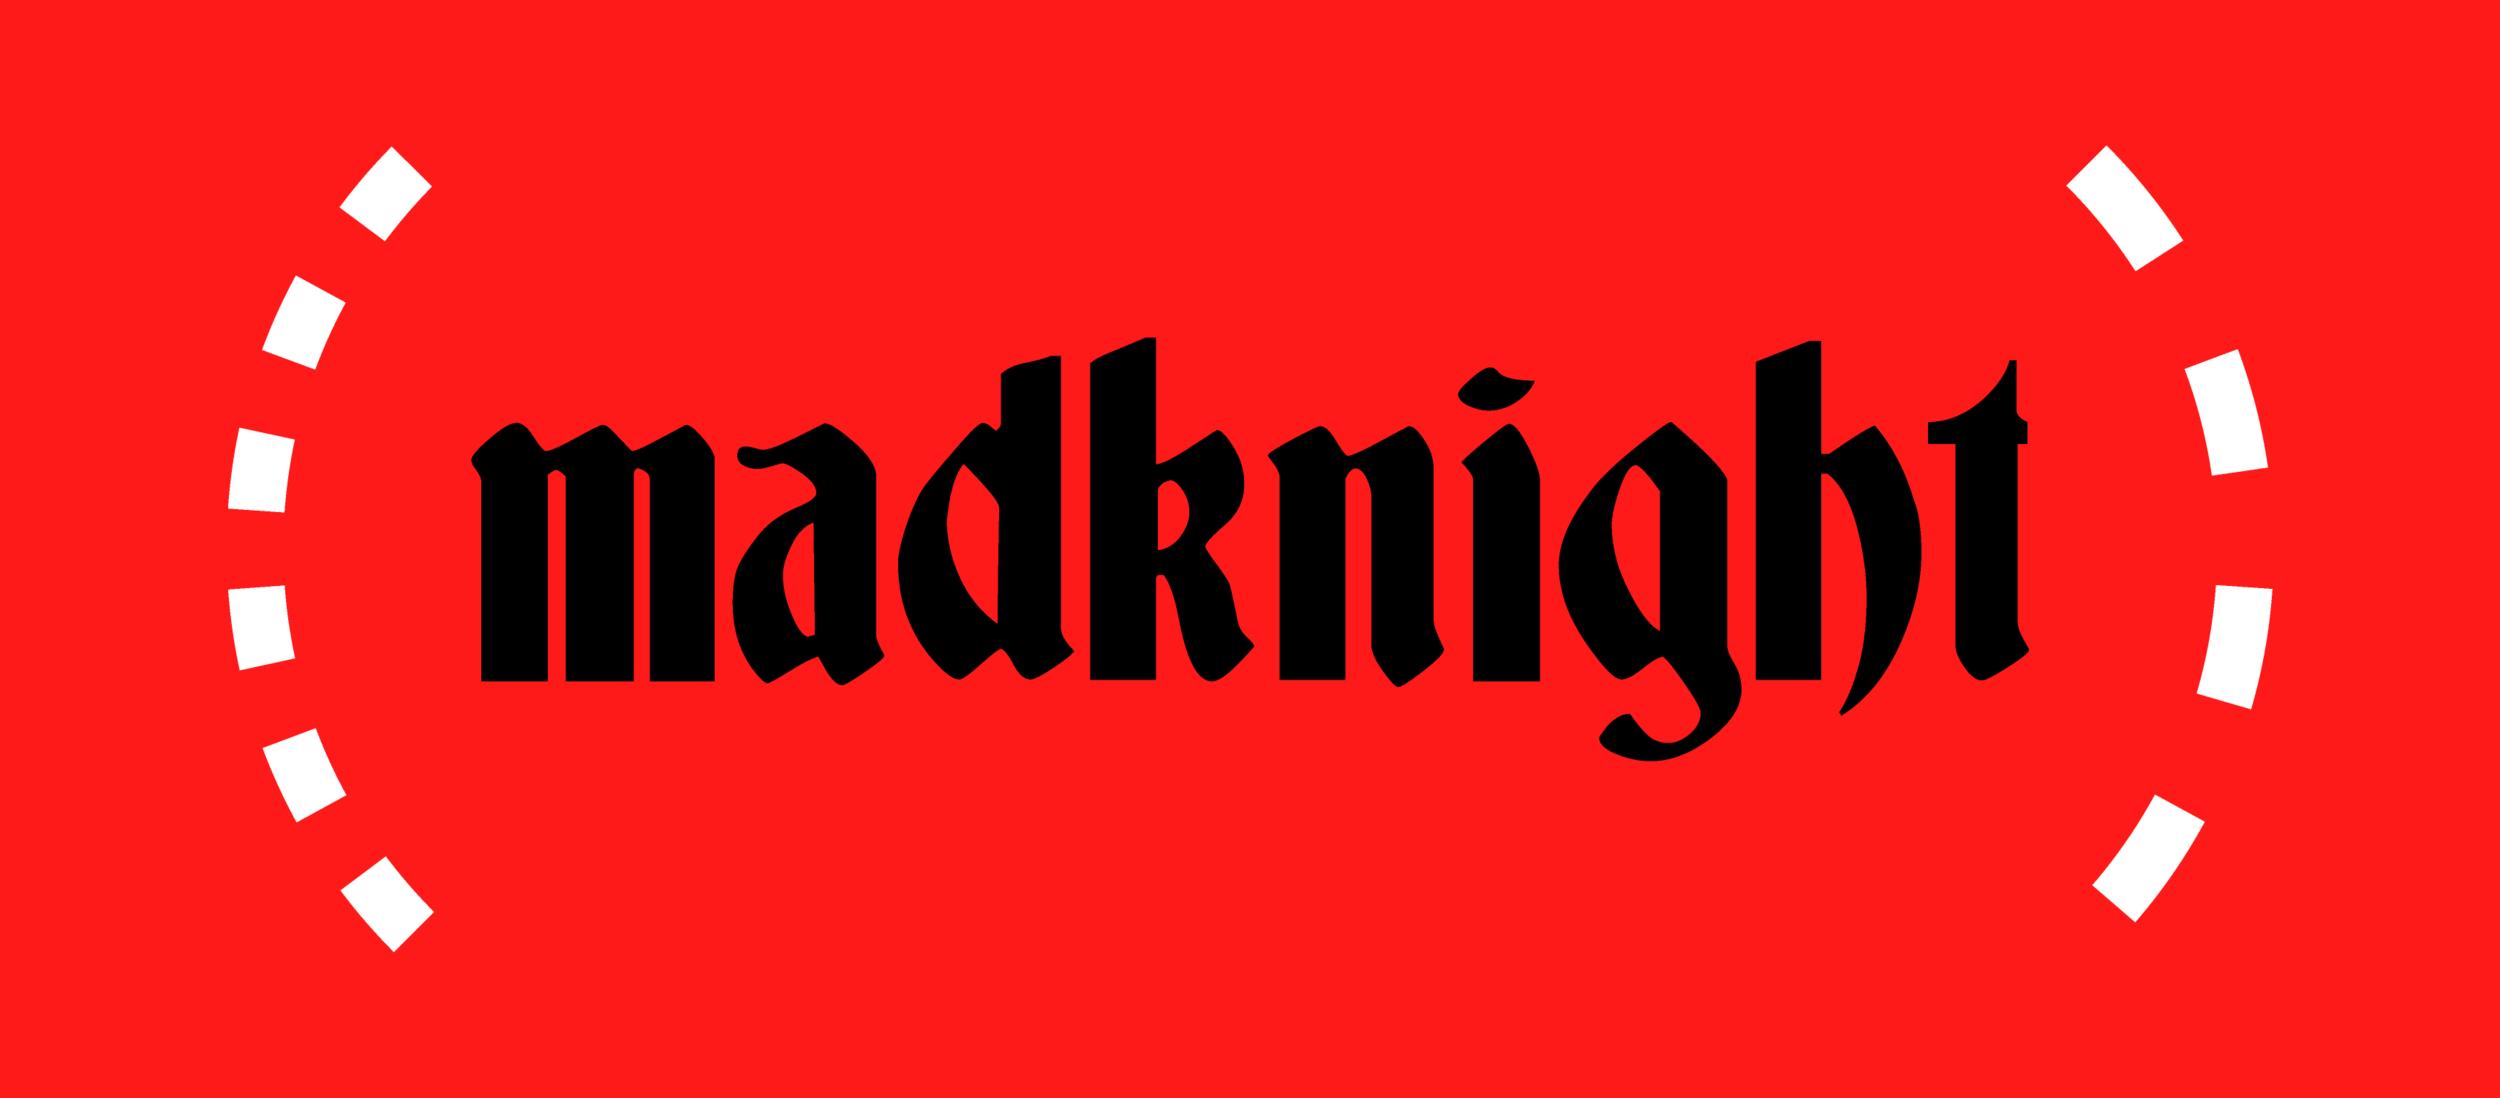 Madknight64_Branding_ 820x360_Facebook.png